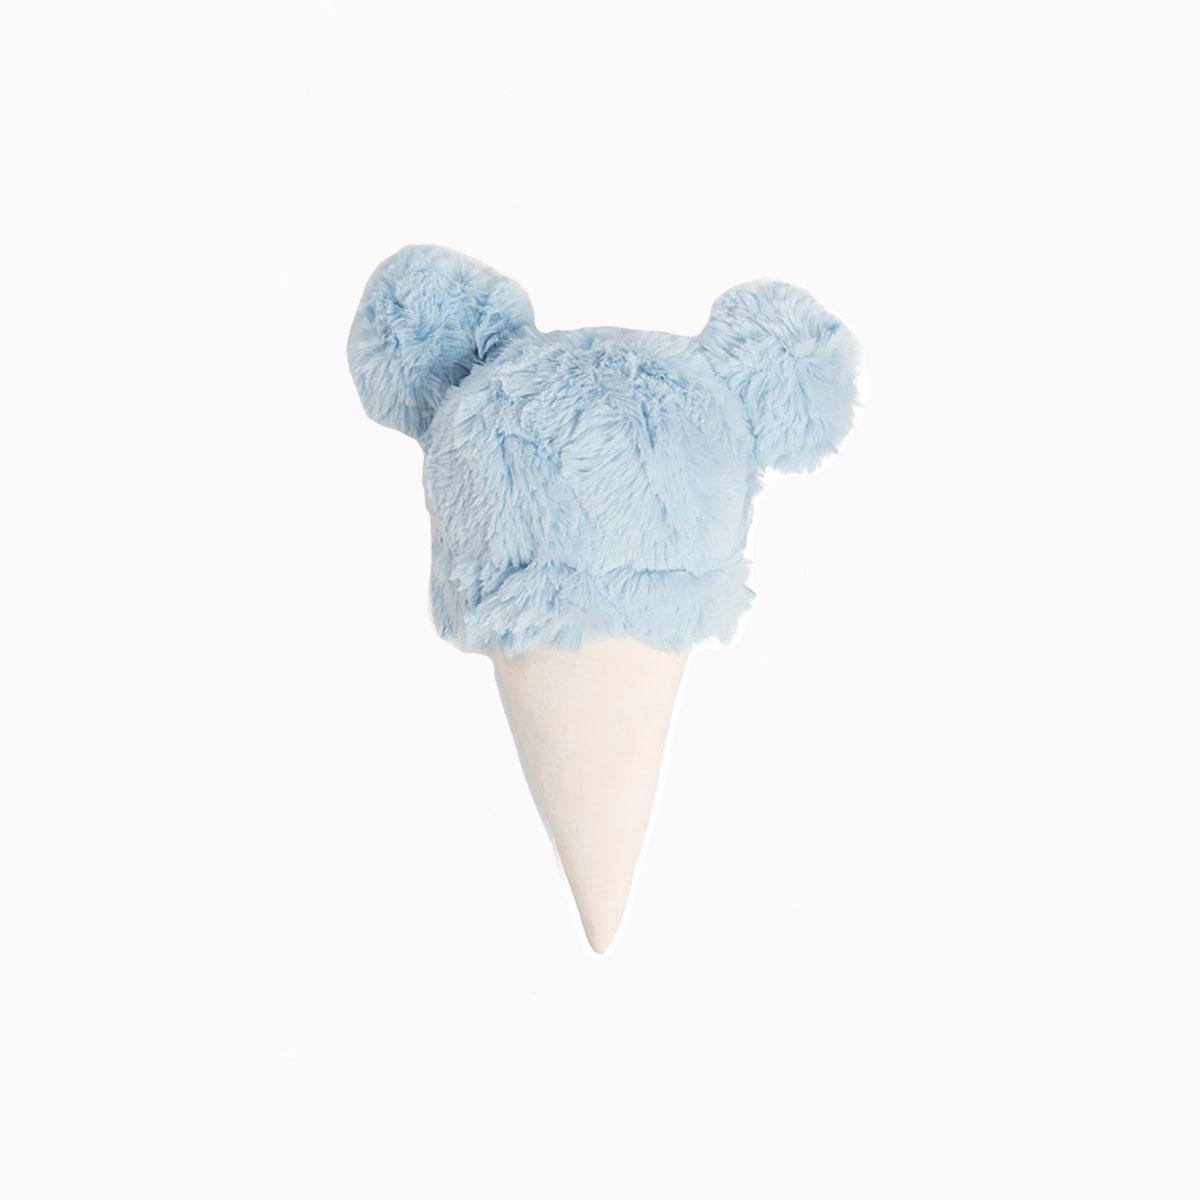 Disney Ice Cream Plush Dog Toy - Mickey Mouse